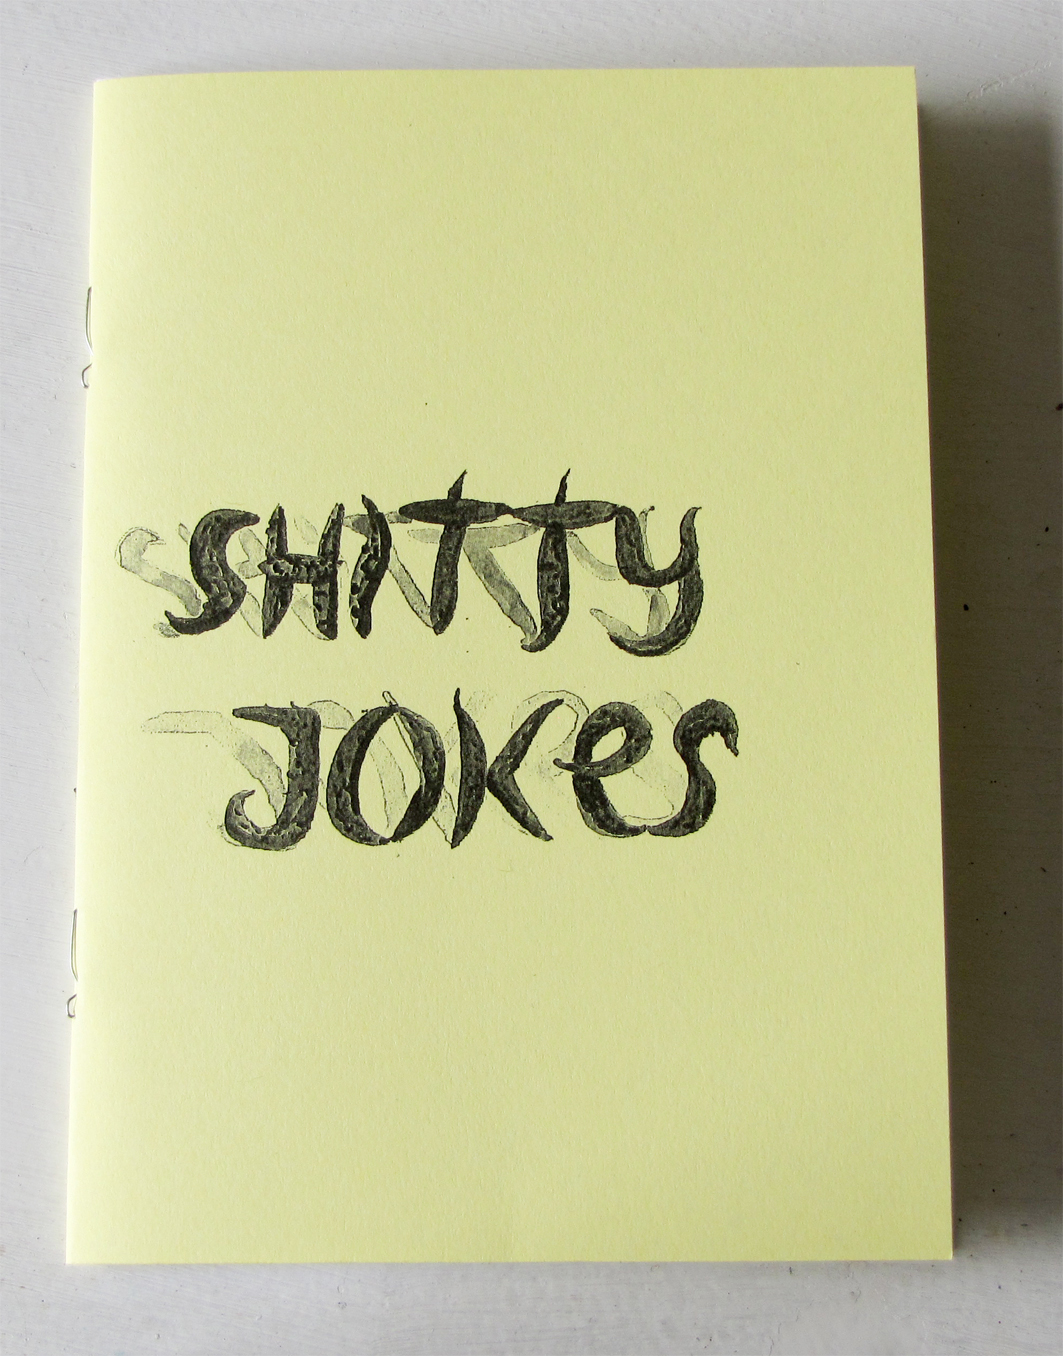 shittyjokes-cover.jpg